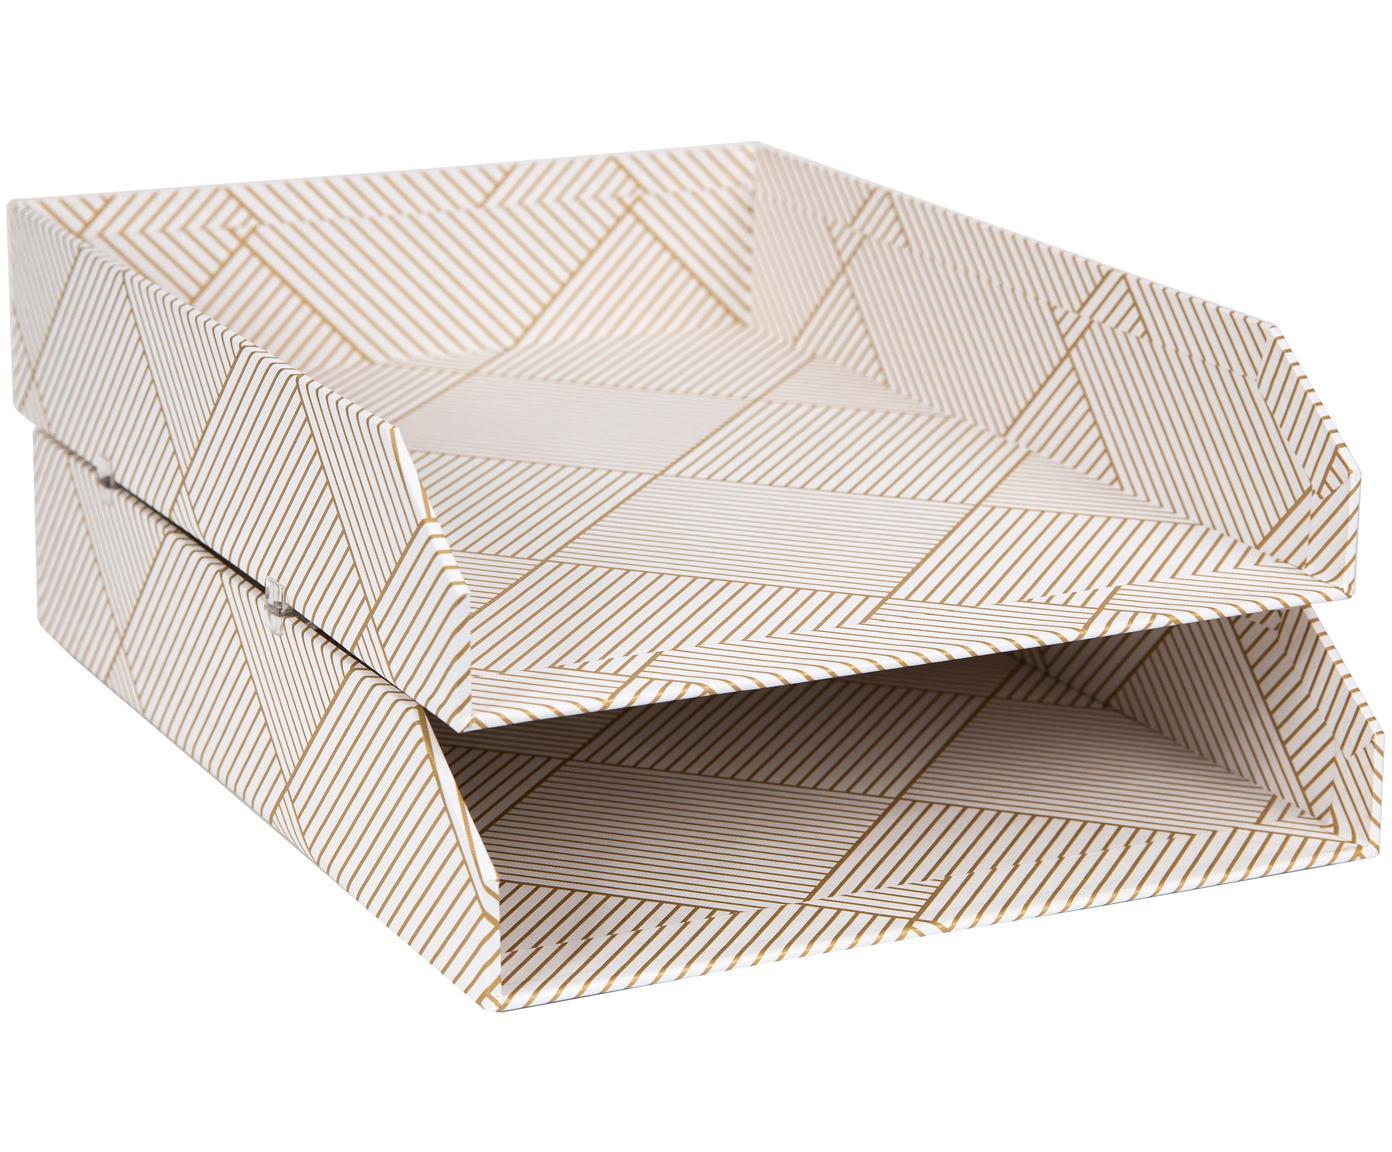 Bandejas para documentos Hakan, 2uds., Cartón laminado, Dorado, blanco, An 23 x F 31 cm